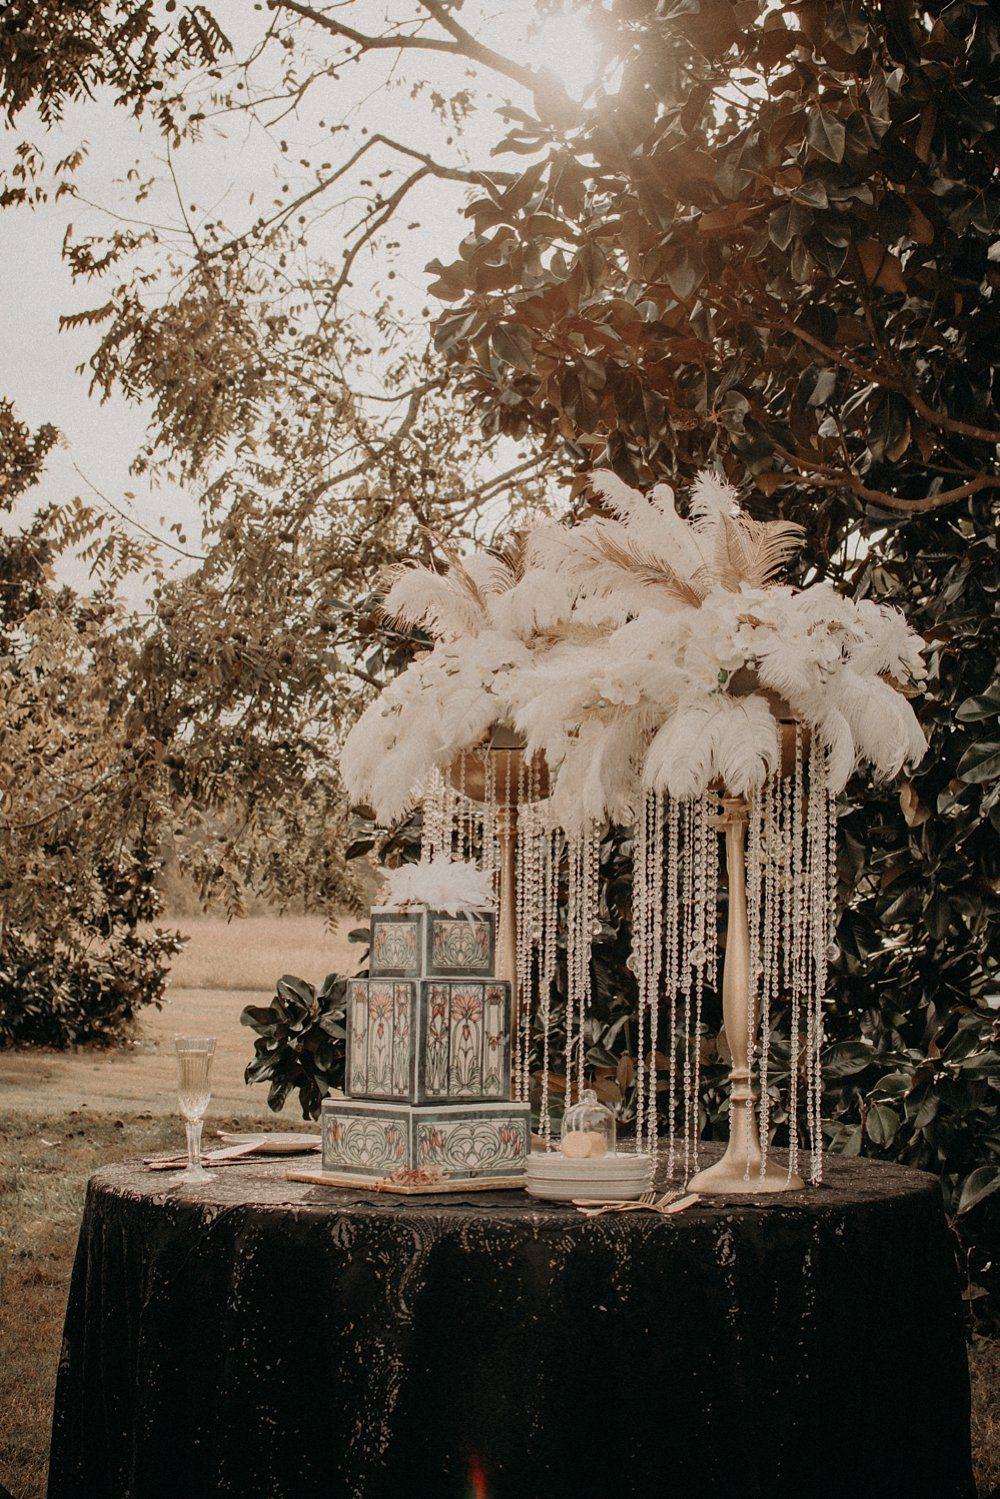 Great Gatsby Inspired Wedding A Princess Inspired Blog Classic Stories Vintage 1920 S Weddi Gatsby Style Wedding Gatsby Wedding Theme 1920s Wedding Theme